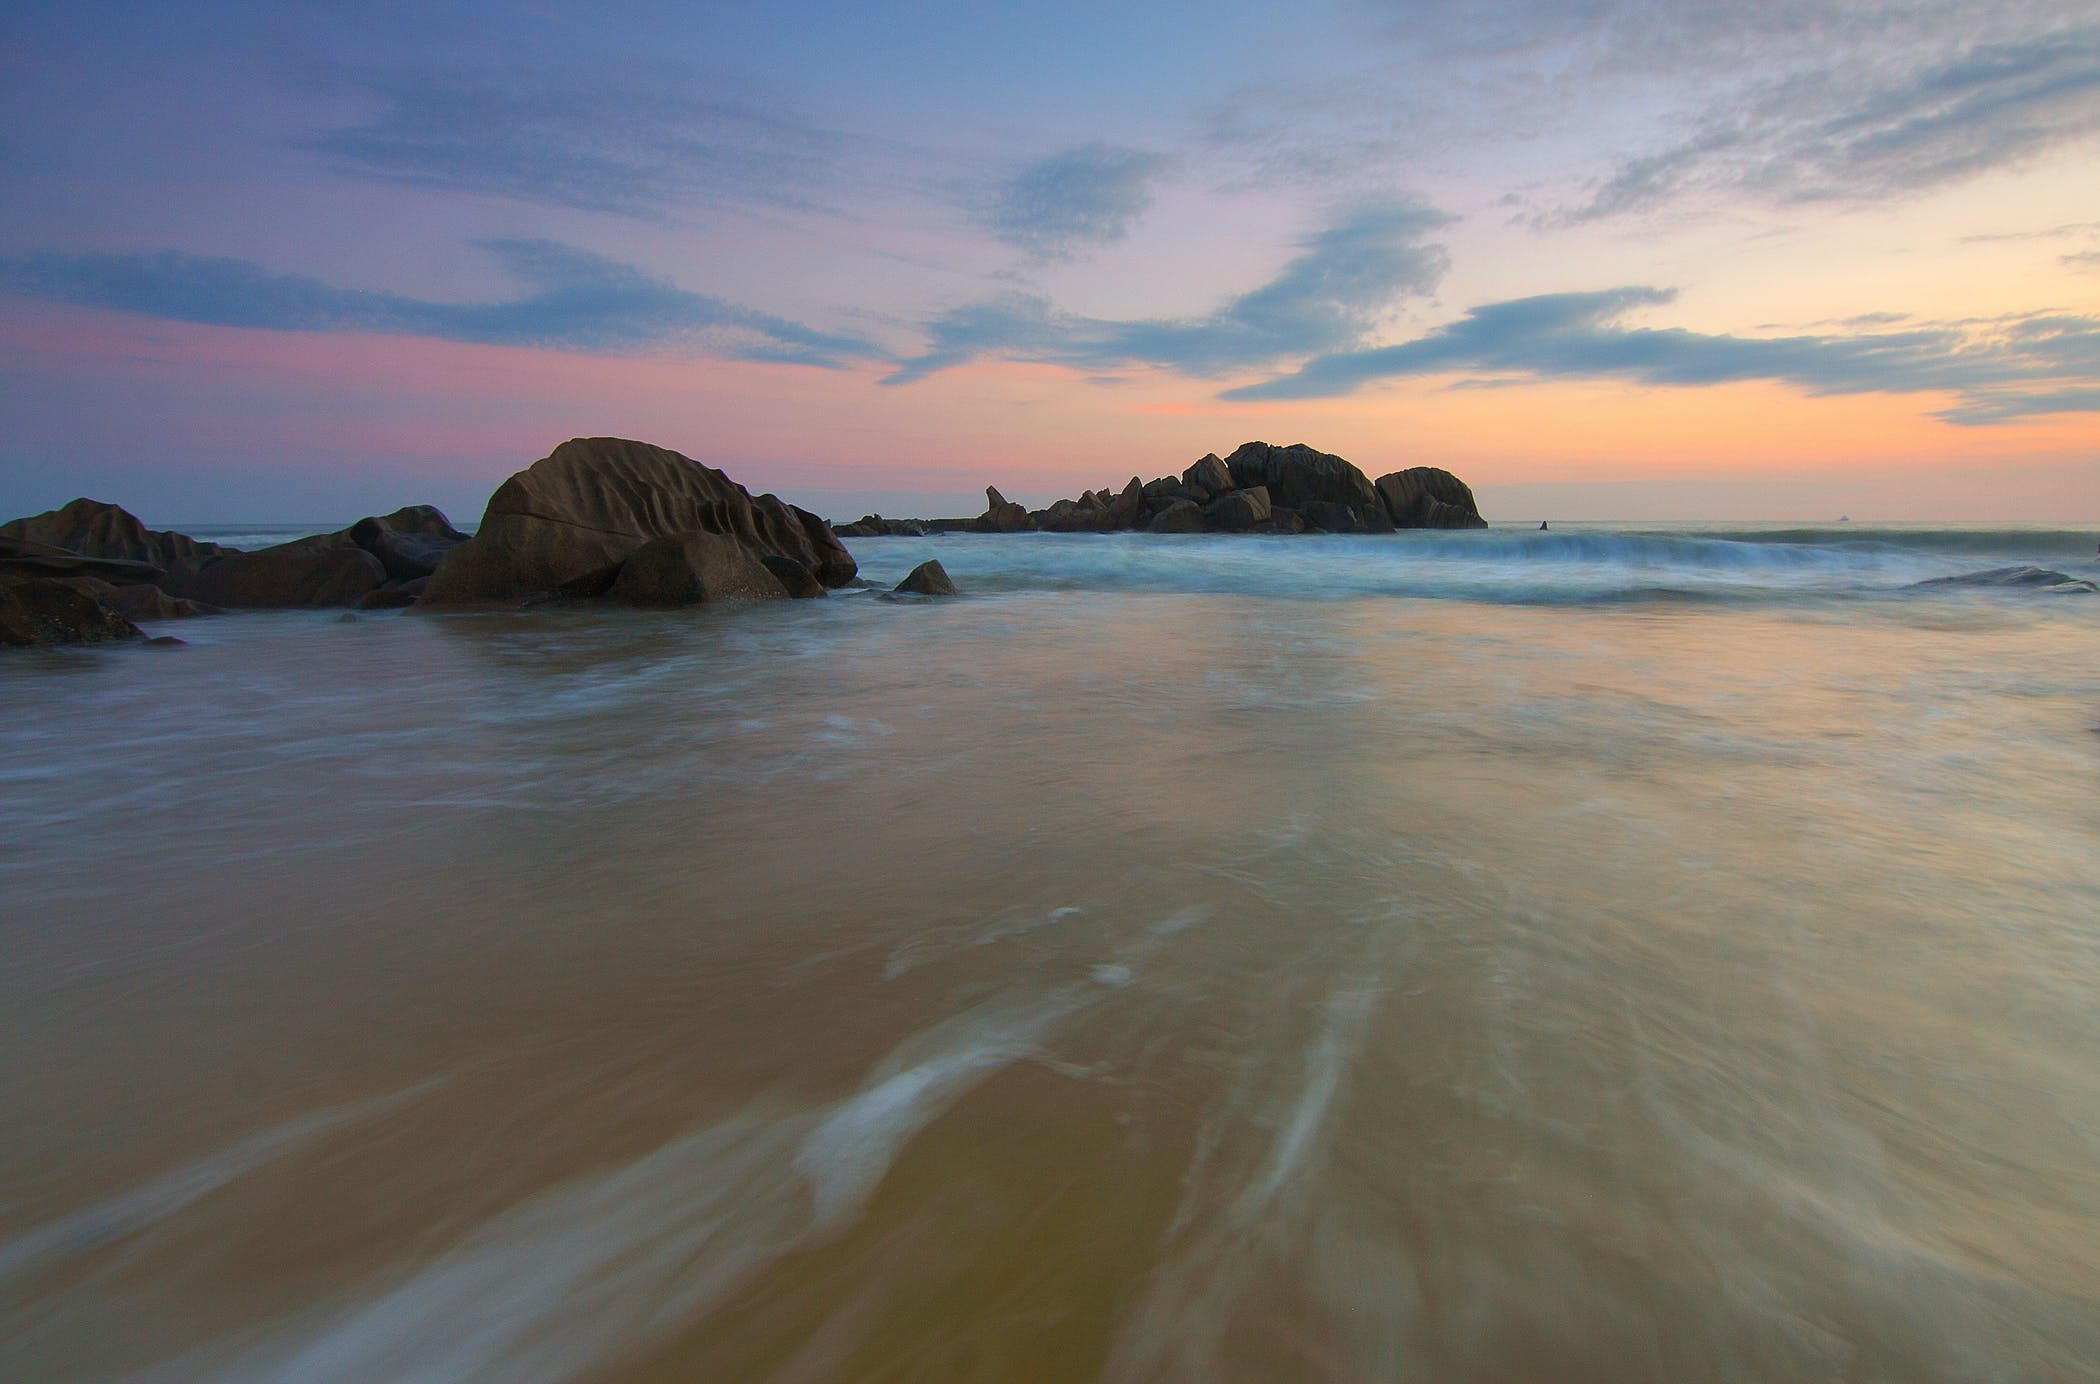 Fotobanka sbezplatnými fotkami na tému krajina, krajina pri mori, mávať, more